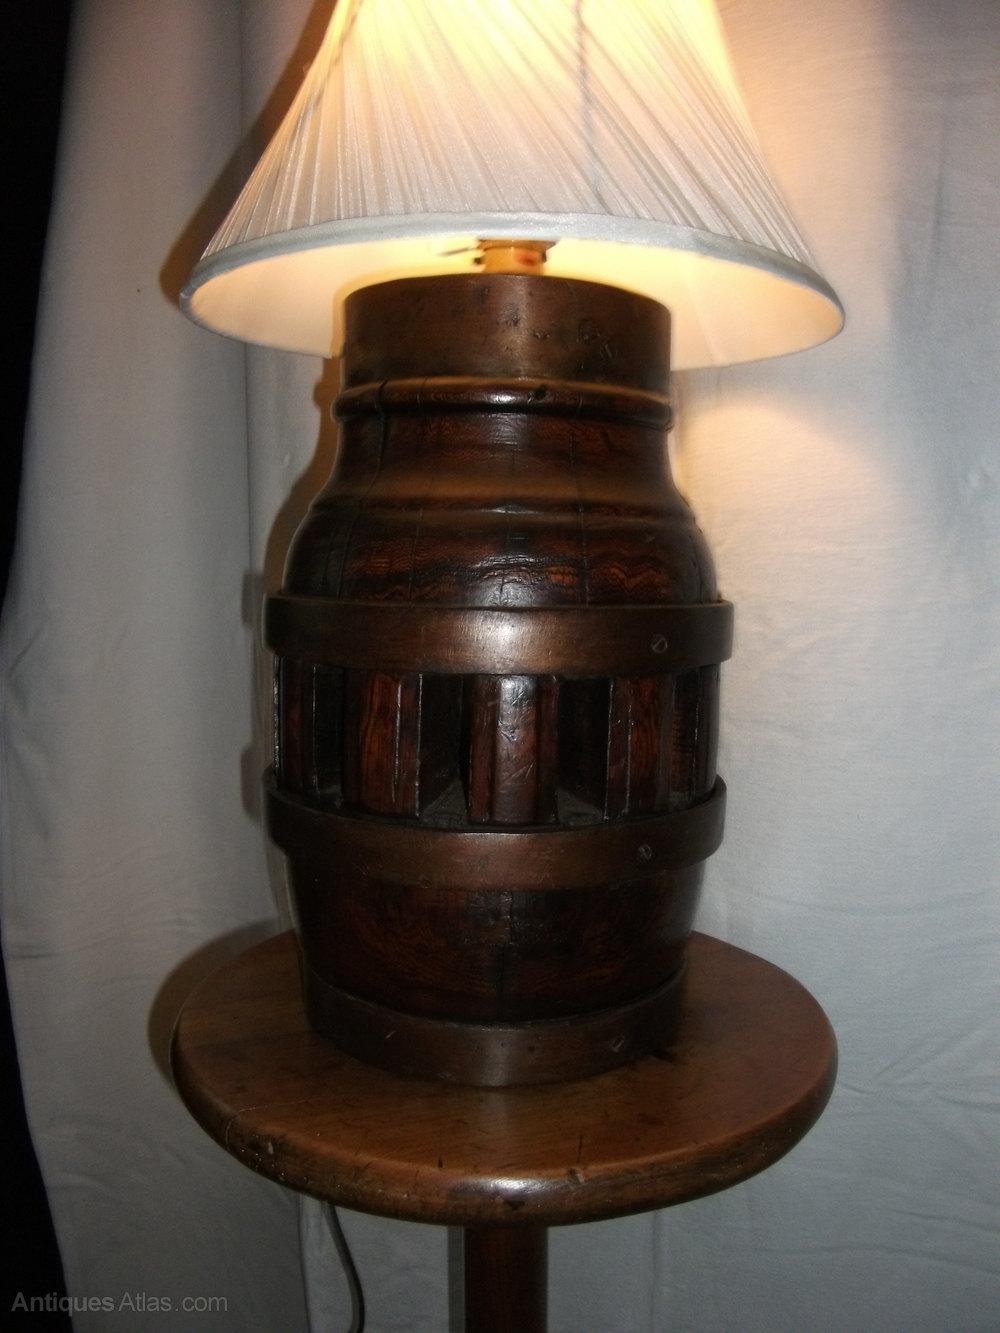 Antiques Atlas - Antique Wagon Wheel Hub Lamp